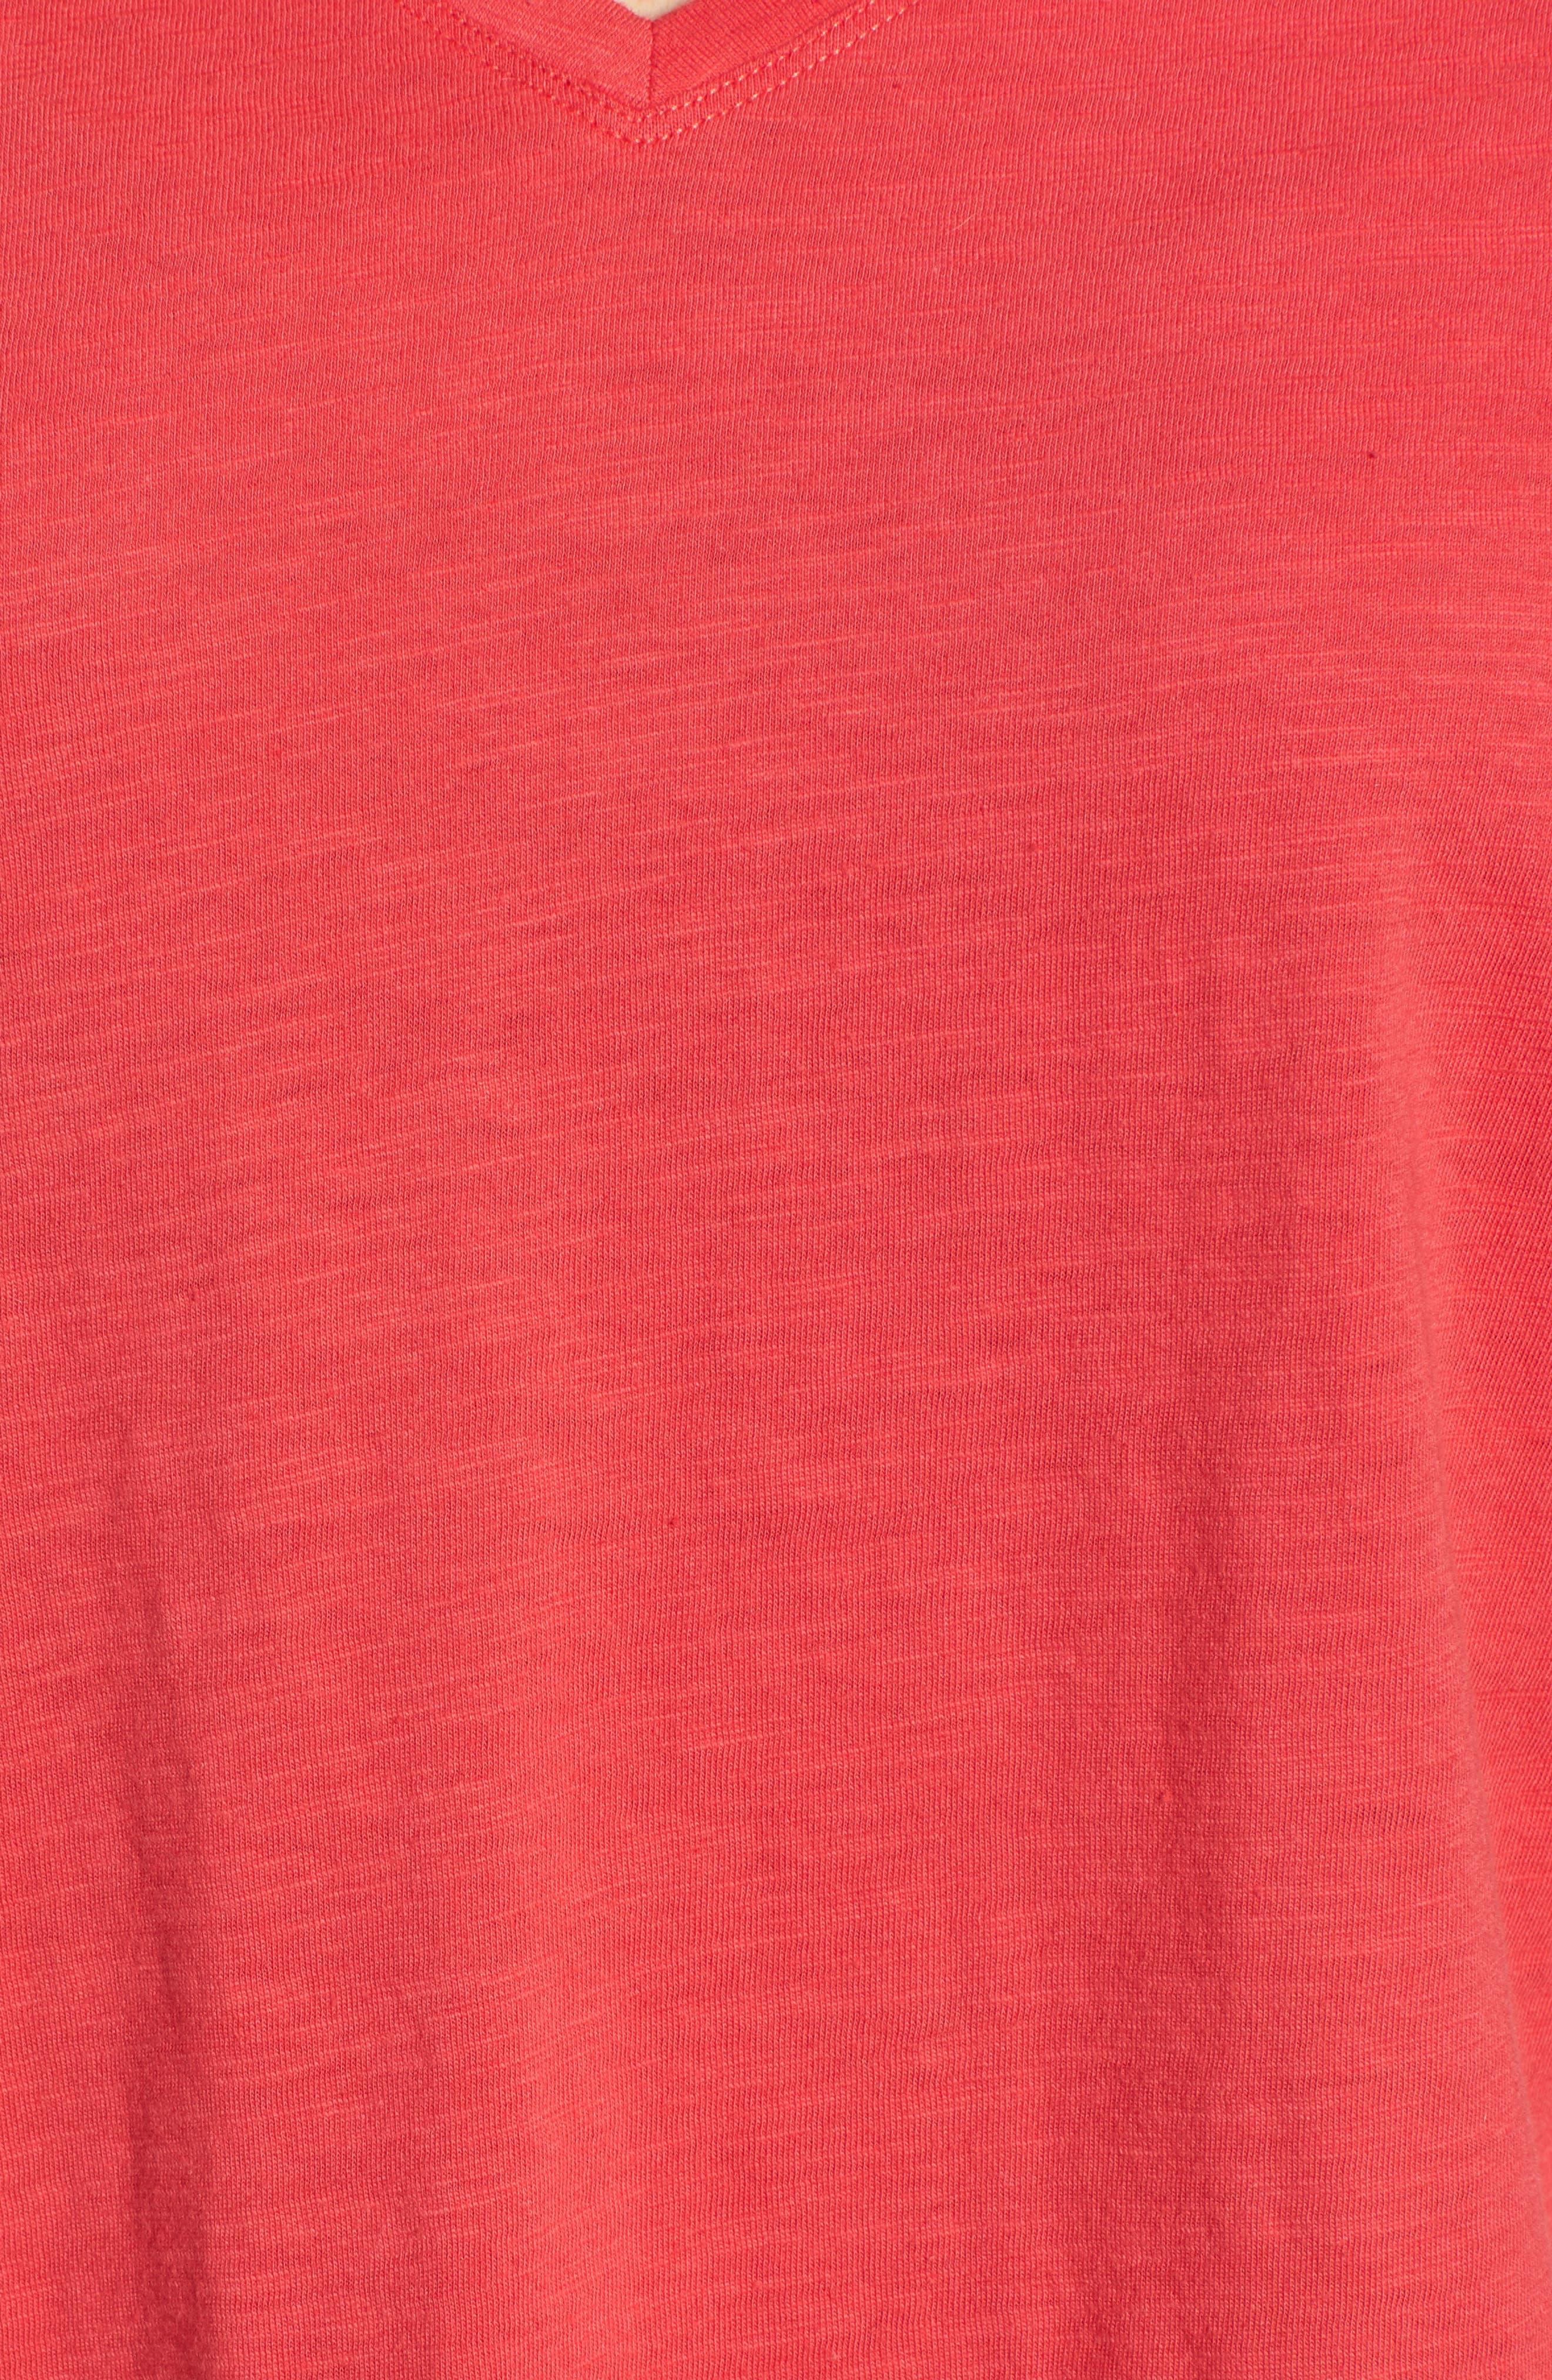 Organic Cotton V-Neck Tee,                             Alternate thumbnail 5, color,                             Strawberry